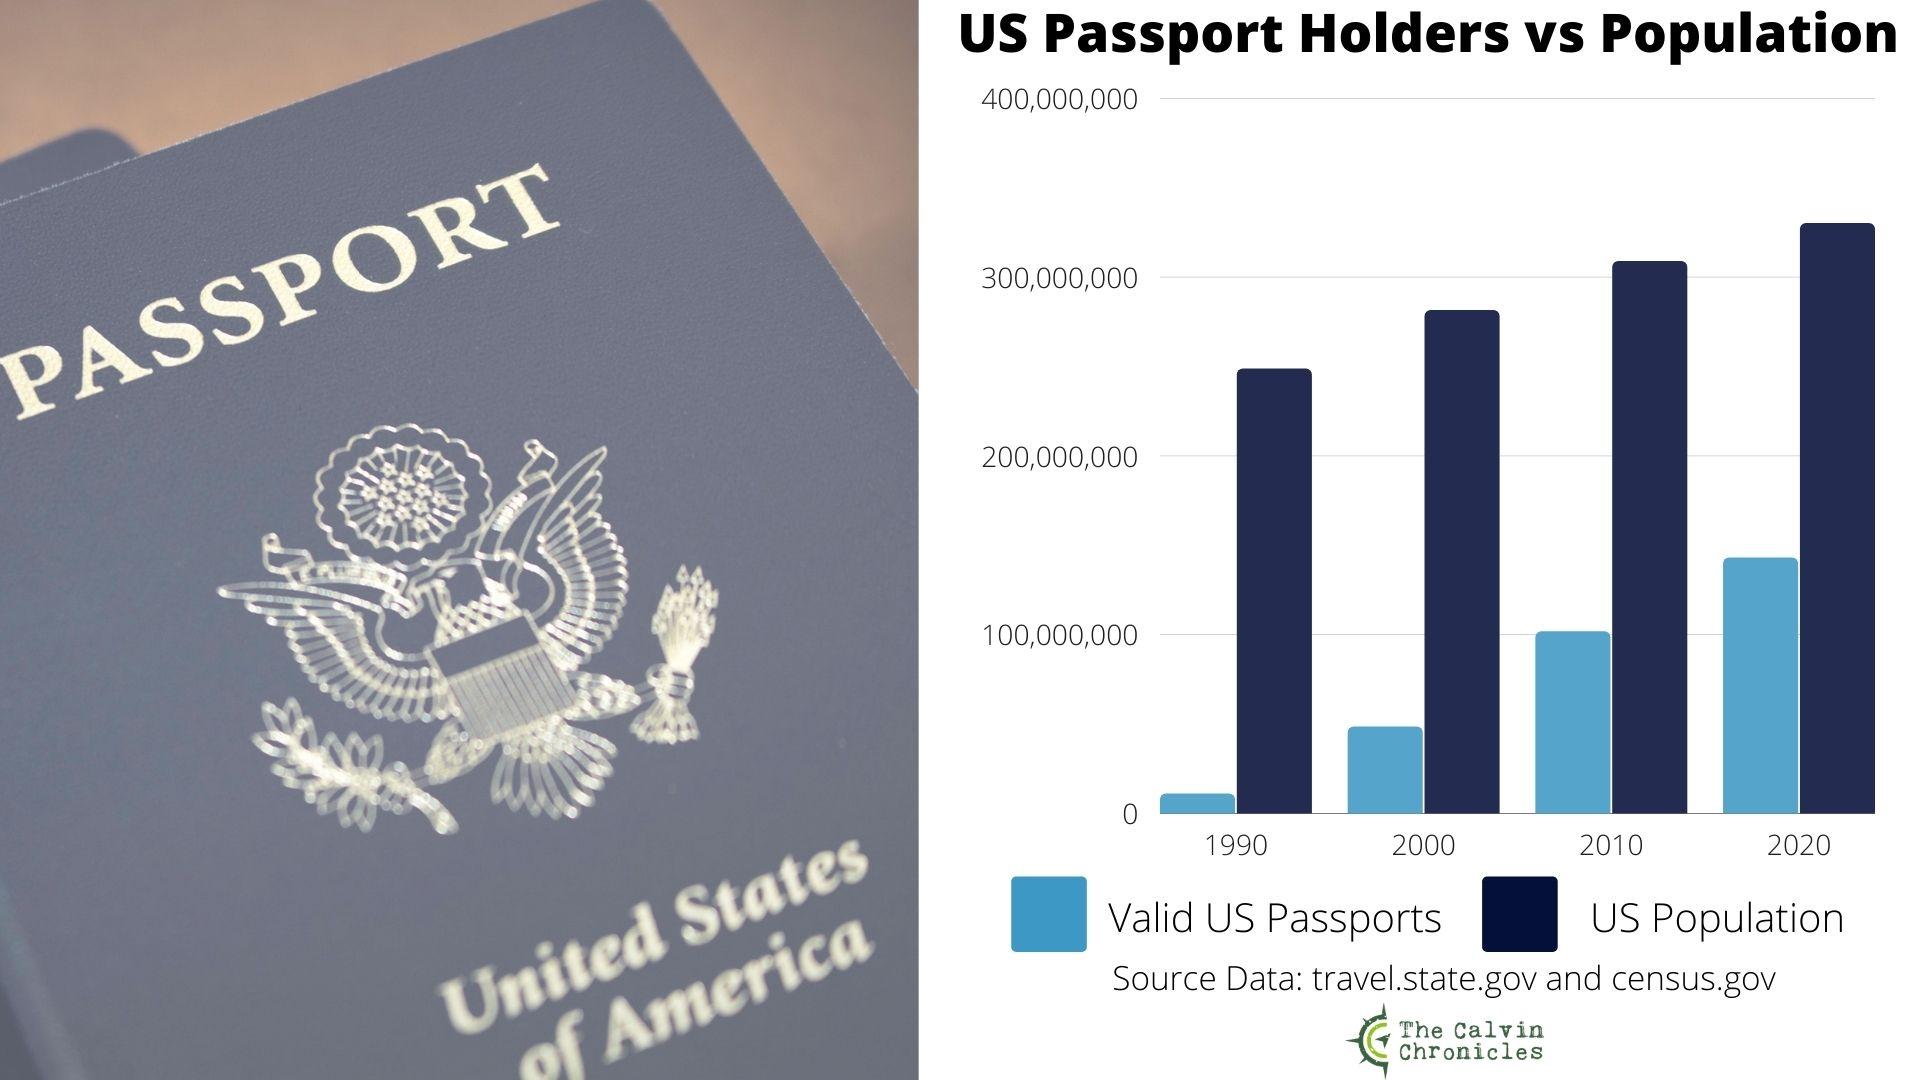 Graph comparing Valid US Passports to US Population